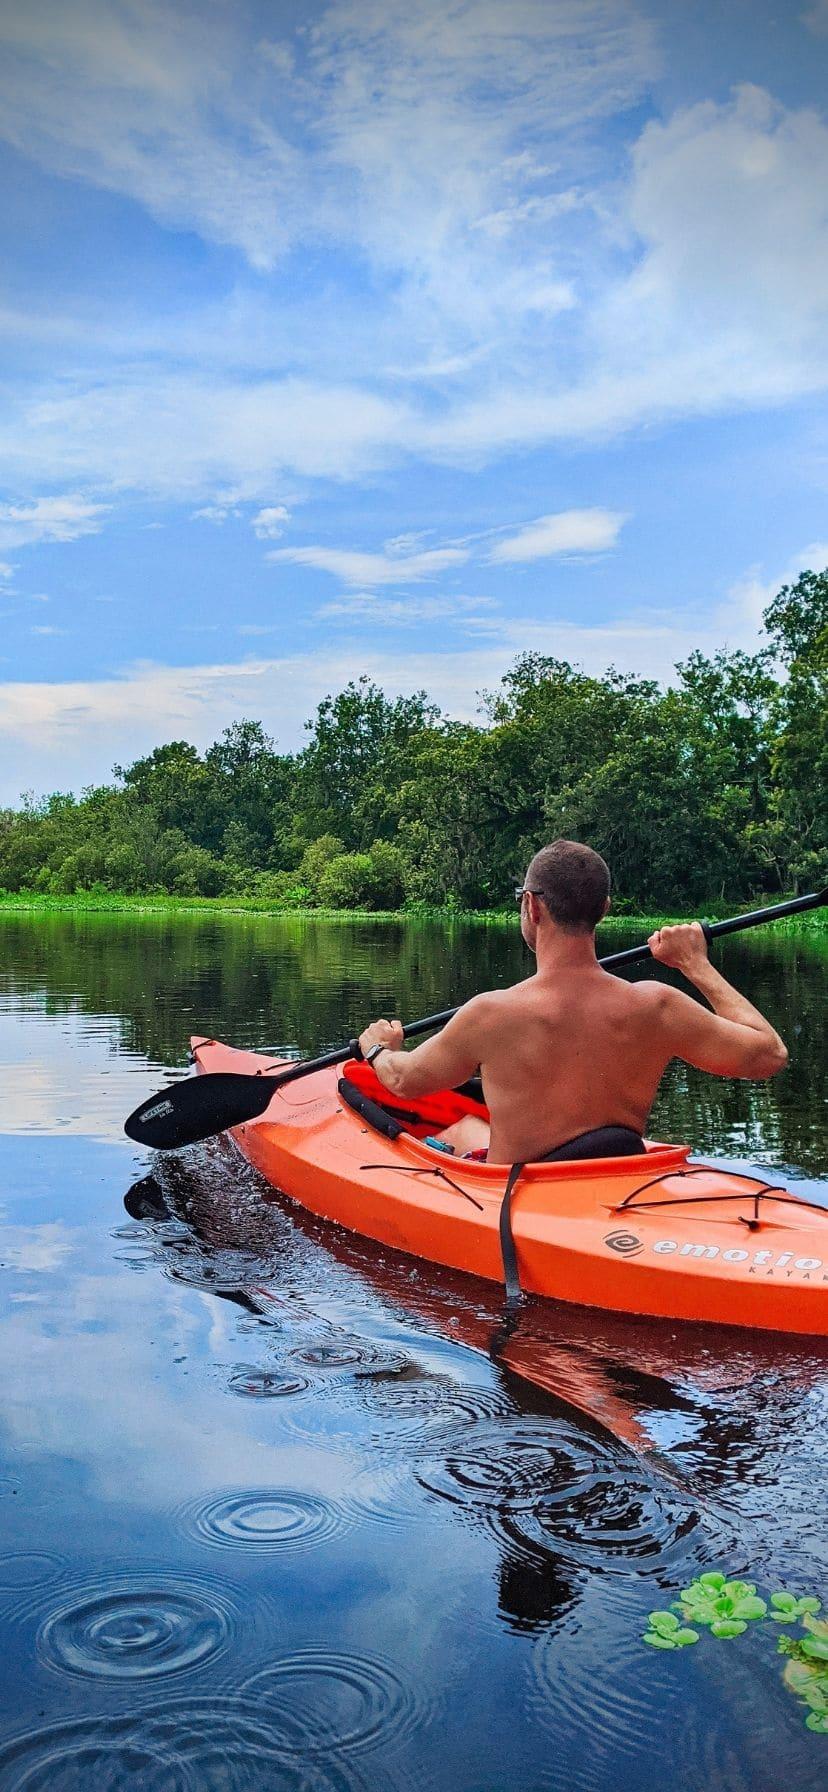 Best Florida Springs for Manatees Kayaking Blue Spring State Park